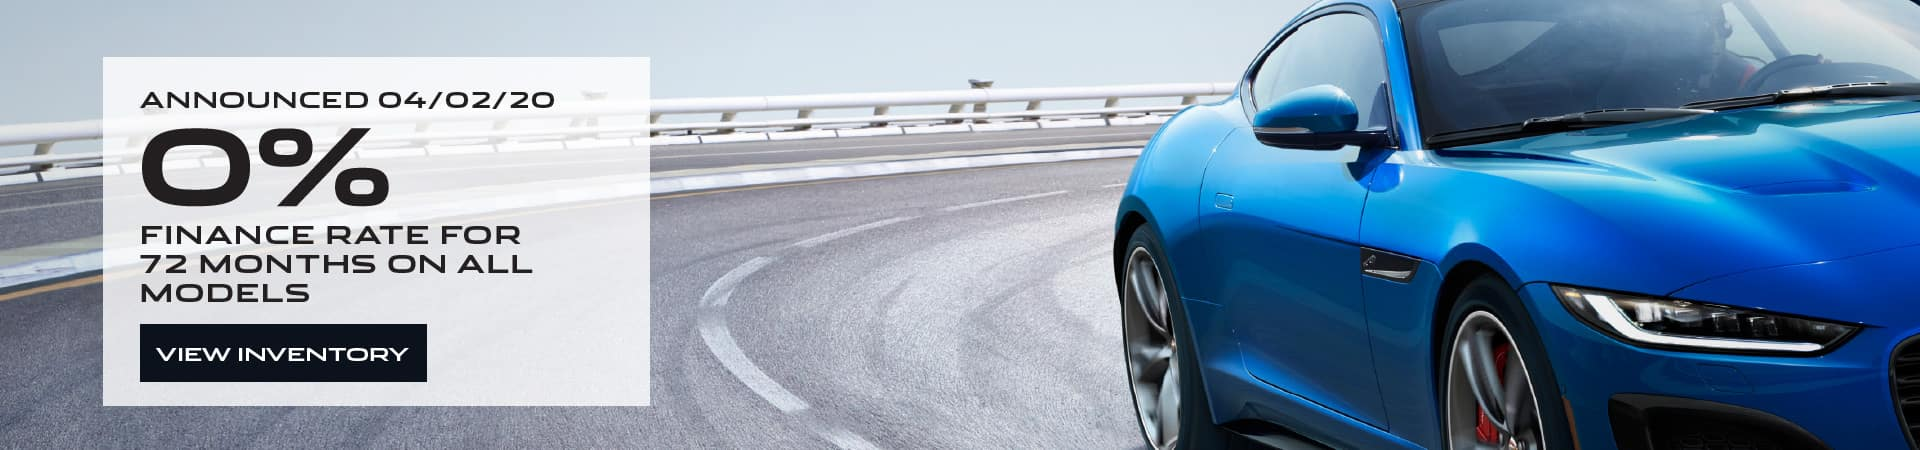 Autobahn Jaguar Fort Worth | 0% Financing for 72 Months